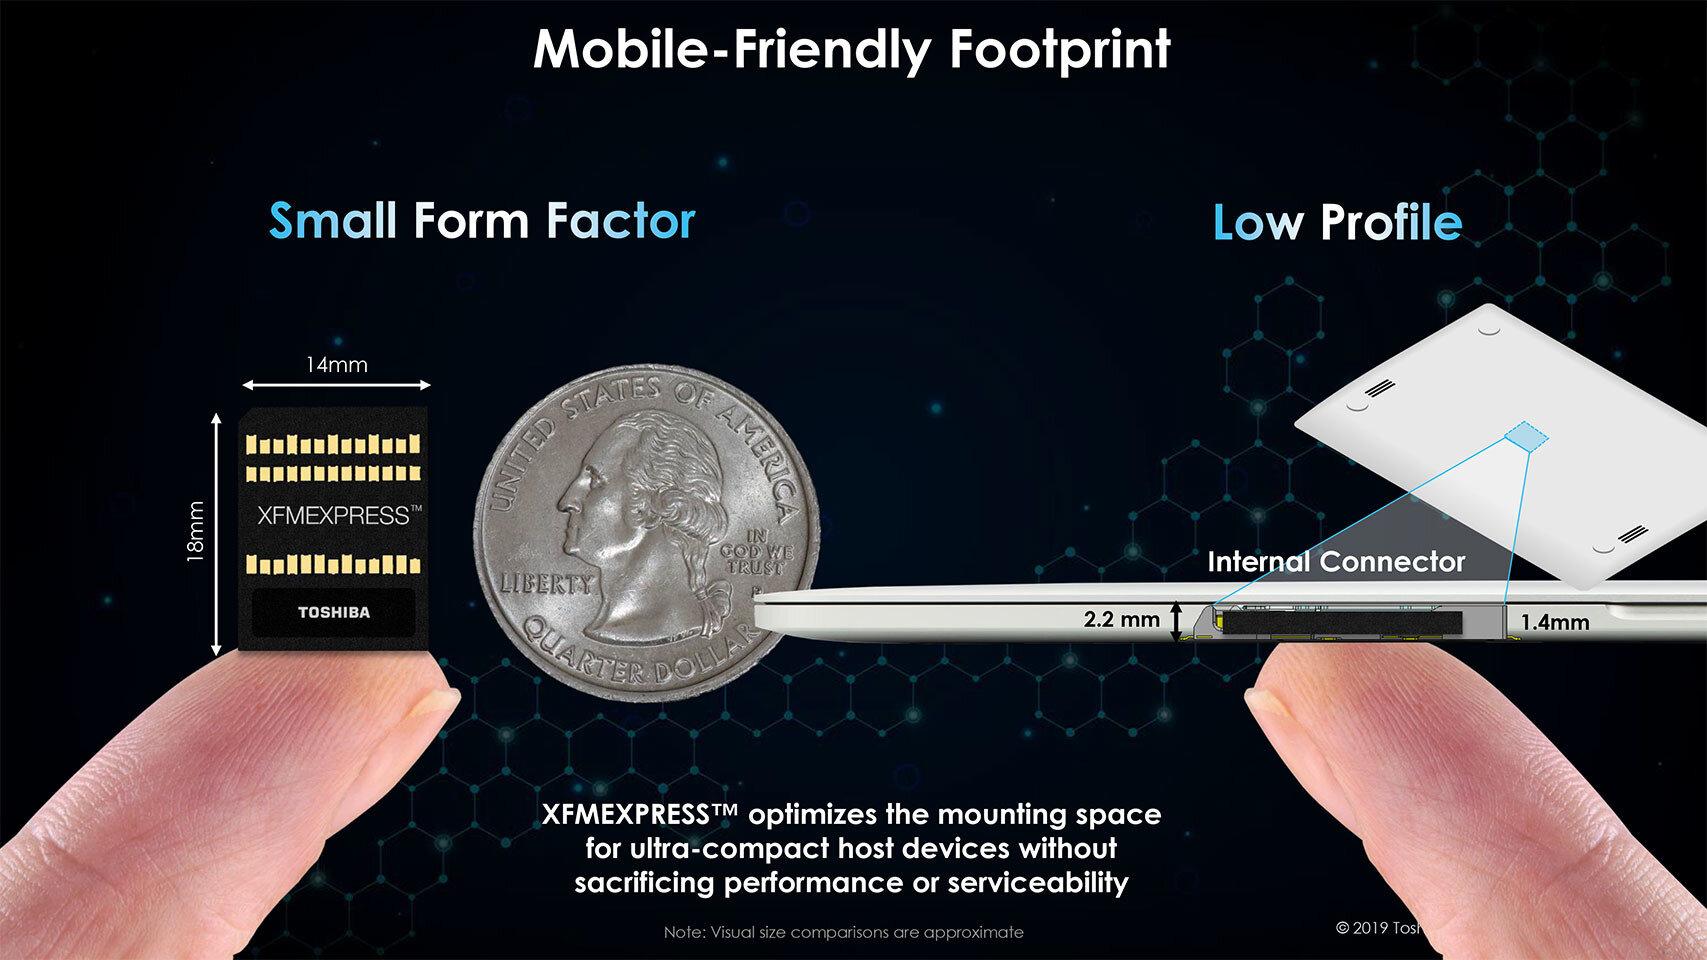 Kompaktes Package für schlanke Mobilgeräte